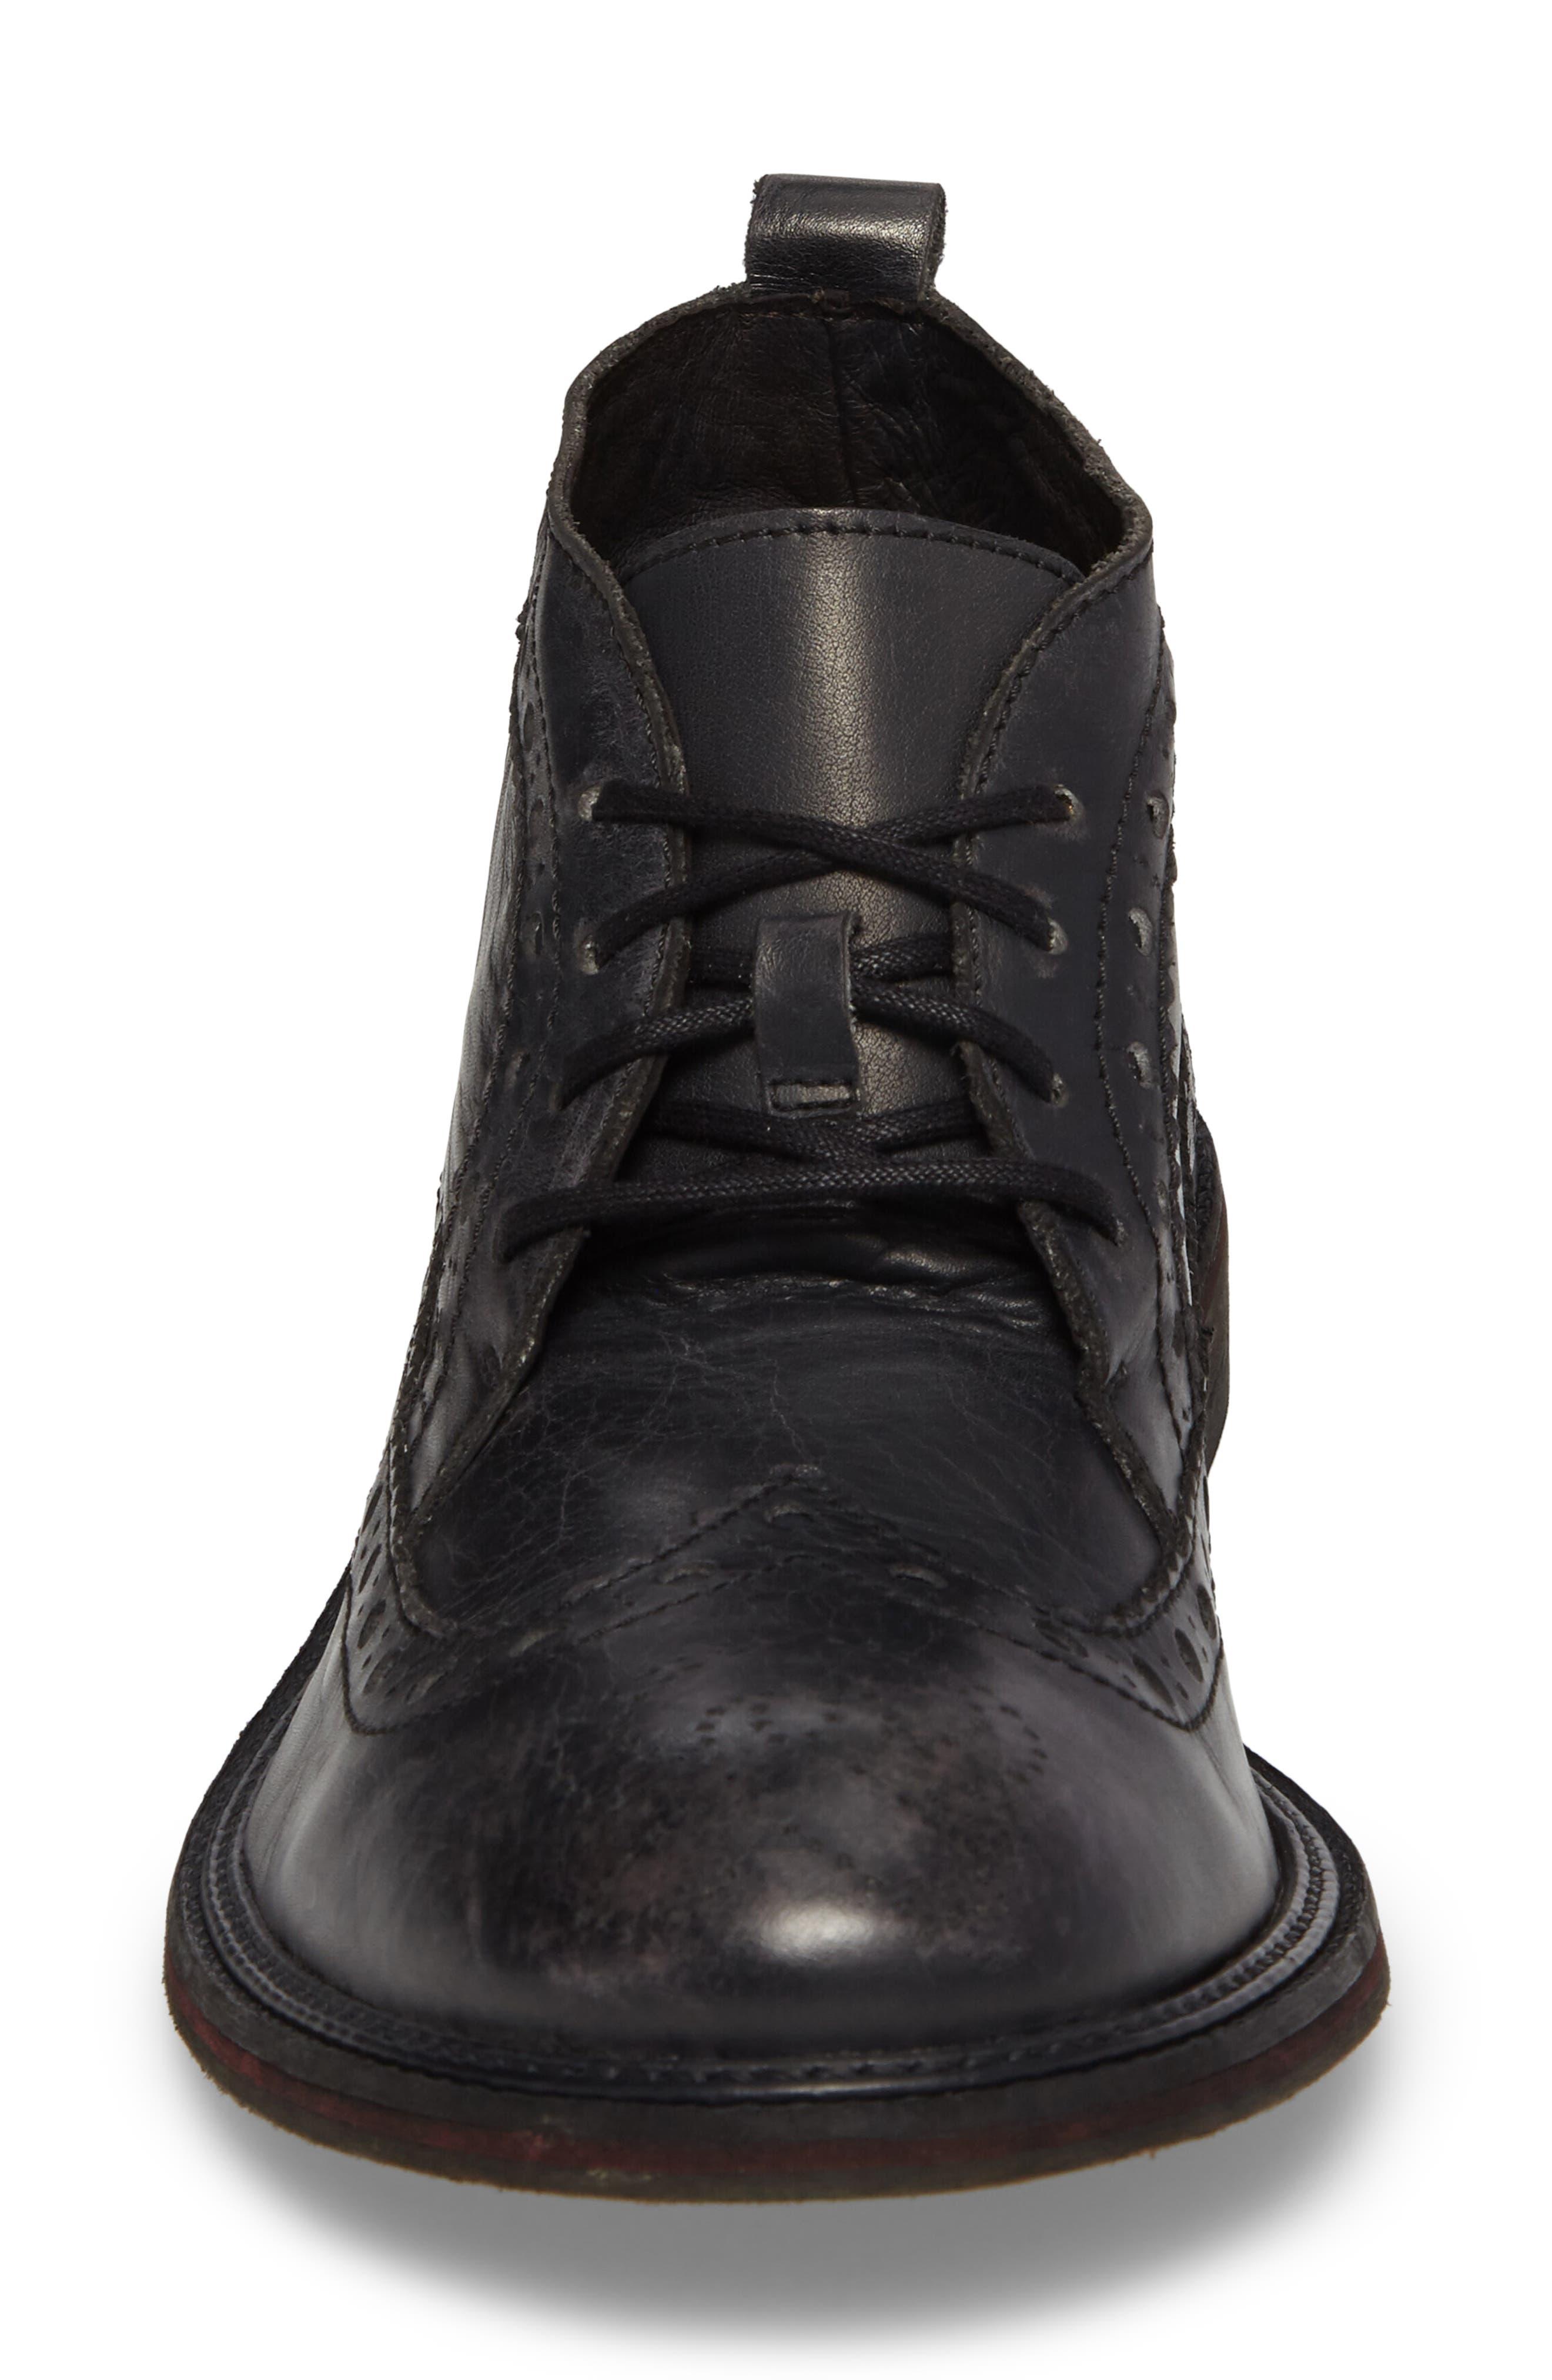 Wile Wingtip Chukka Boot,                             Alternate thumbnail 4, color,                             Black